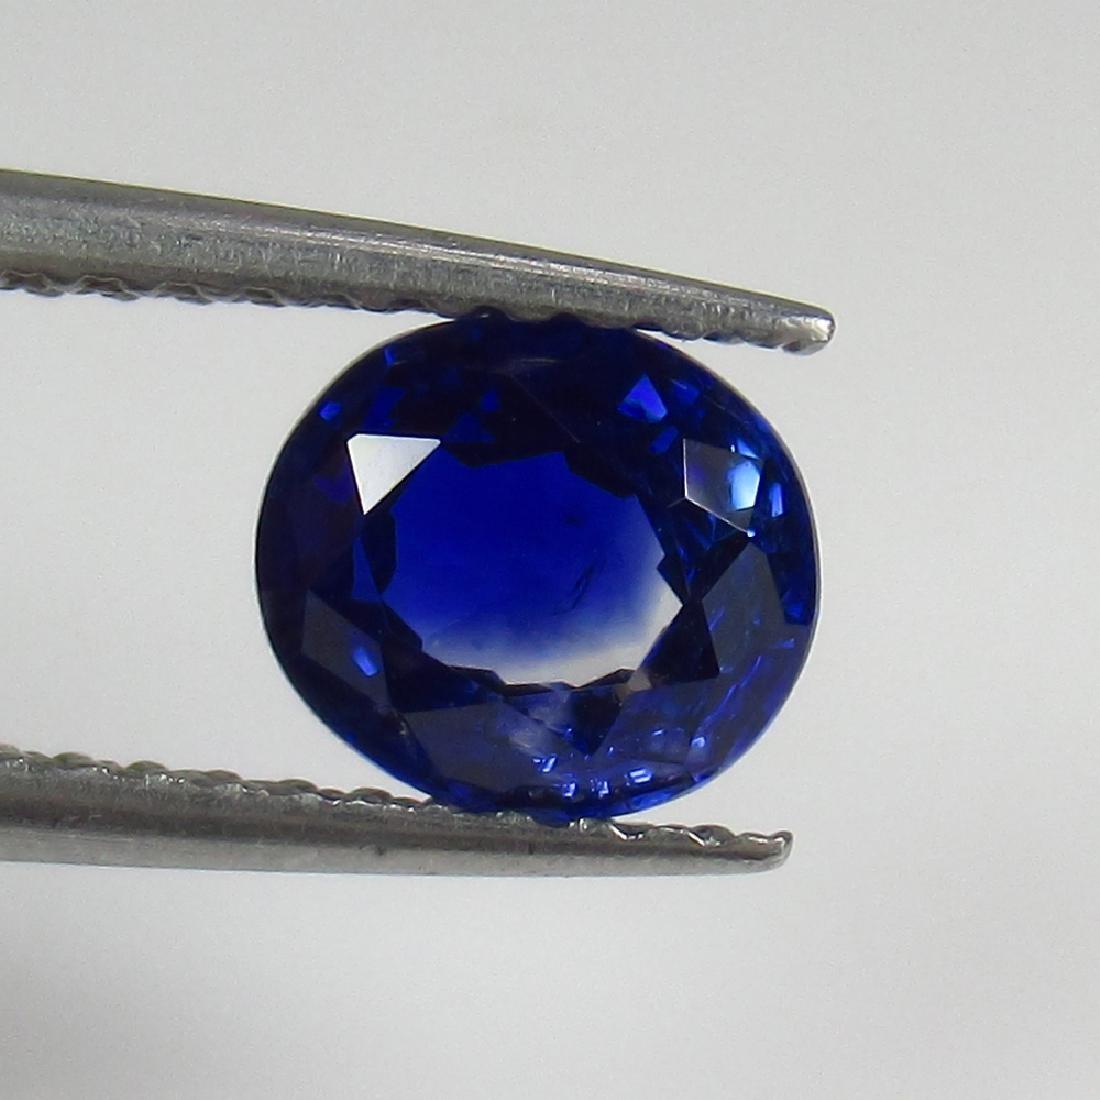 1.11 Ct Genuine Ceylon Deep Blue Sapphire Oval Cut